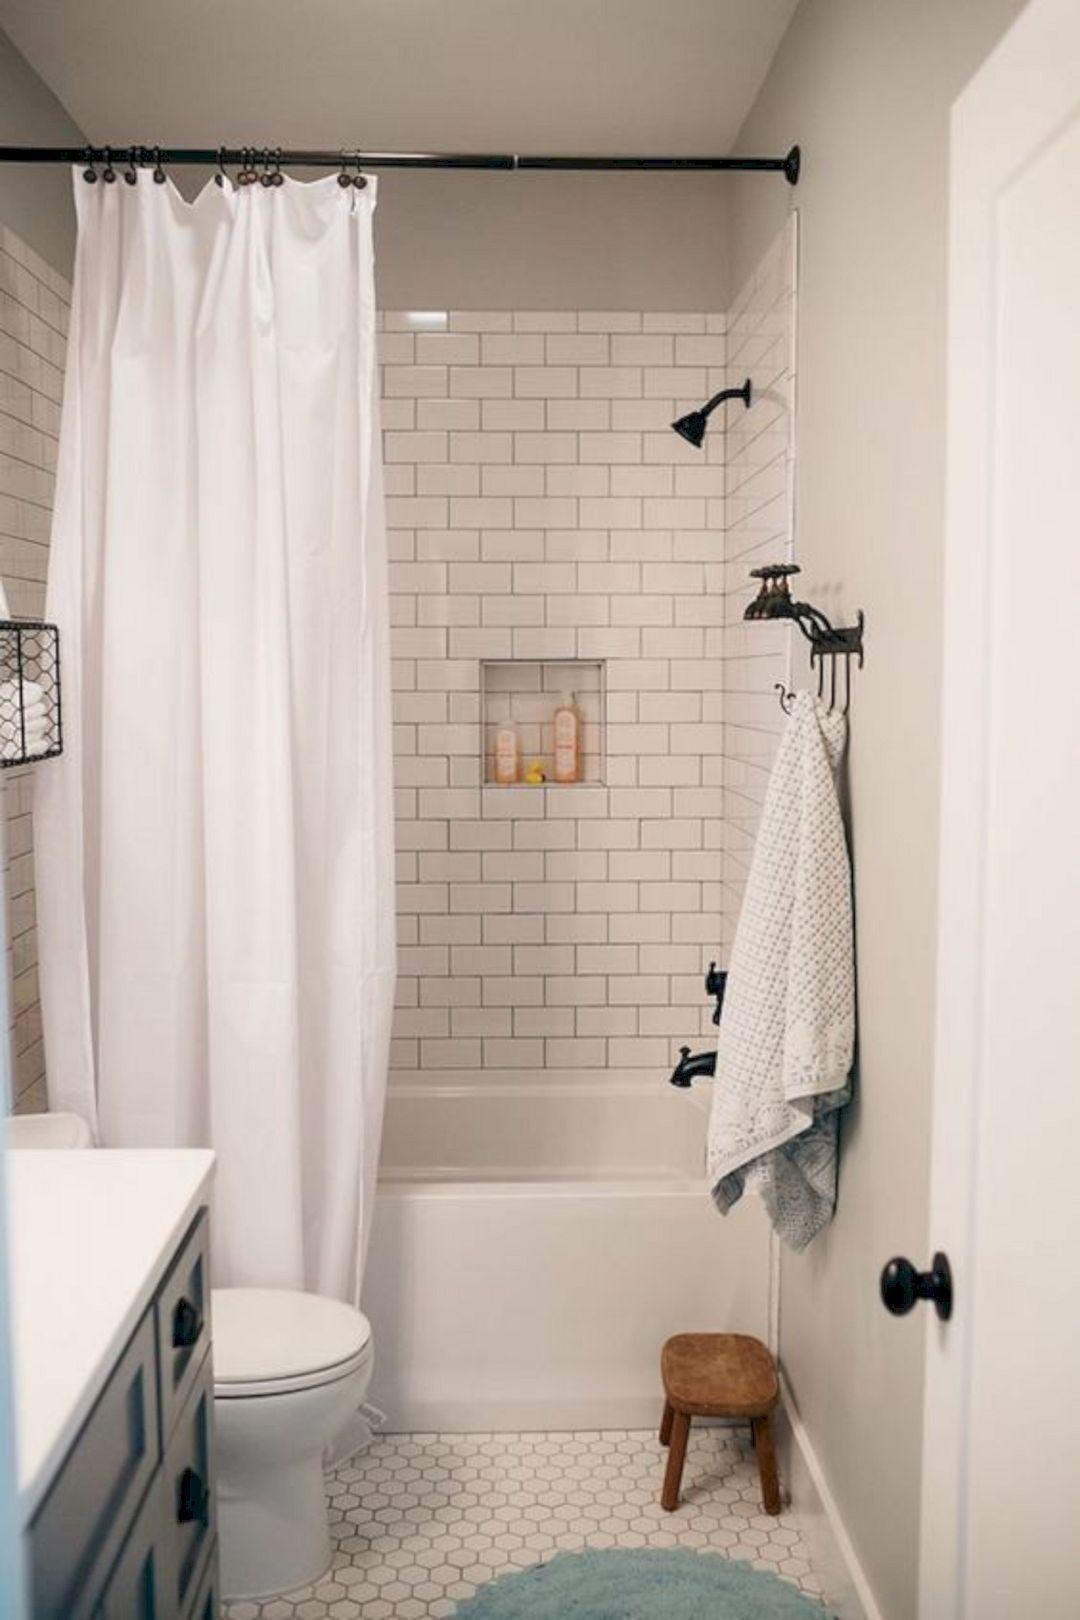 16 small bathroom renovation ideas httpswww